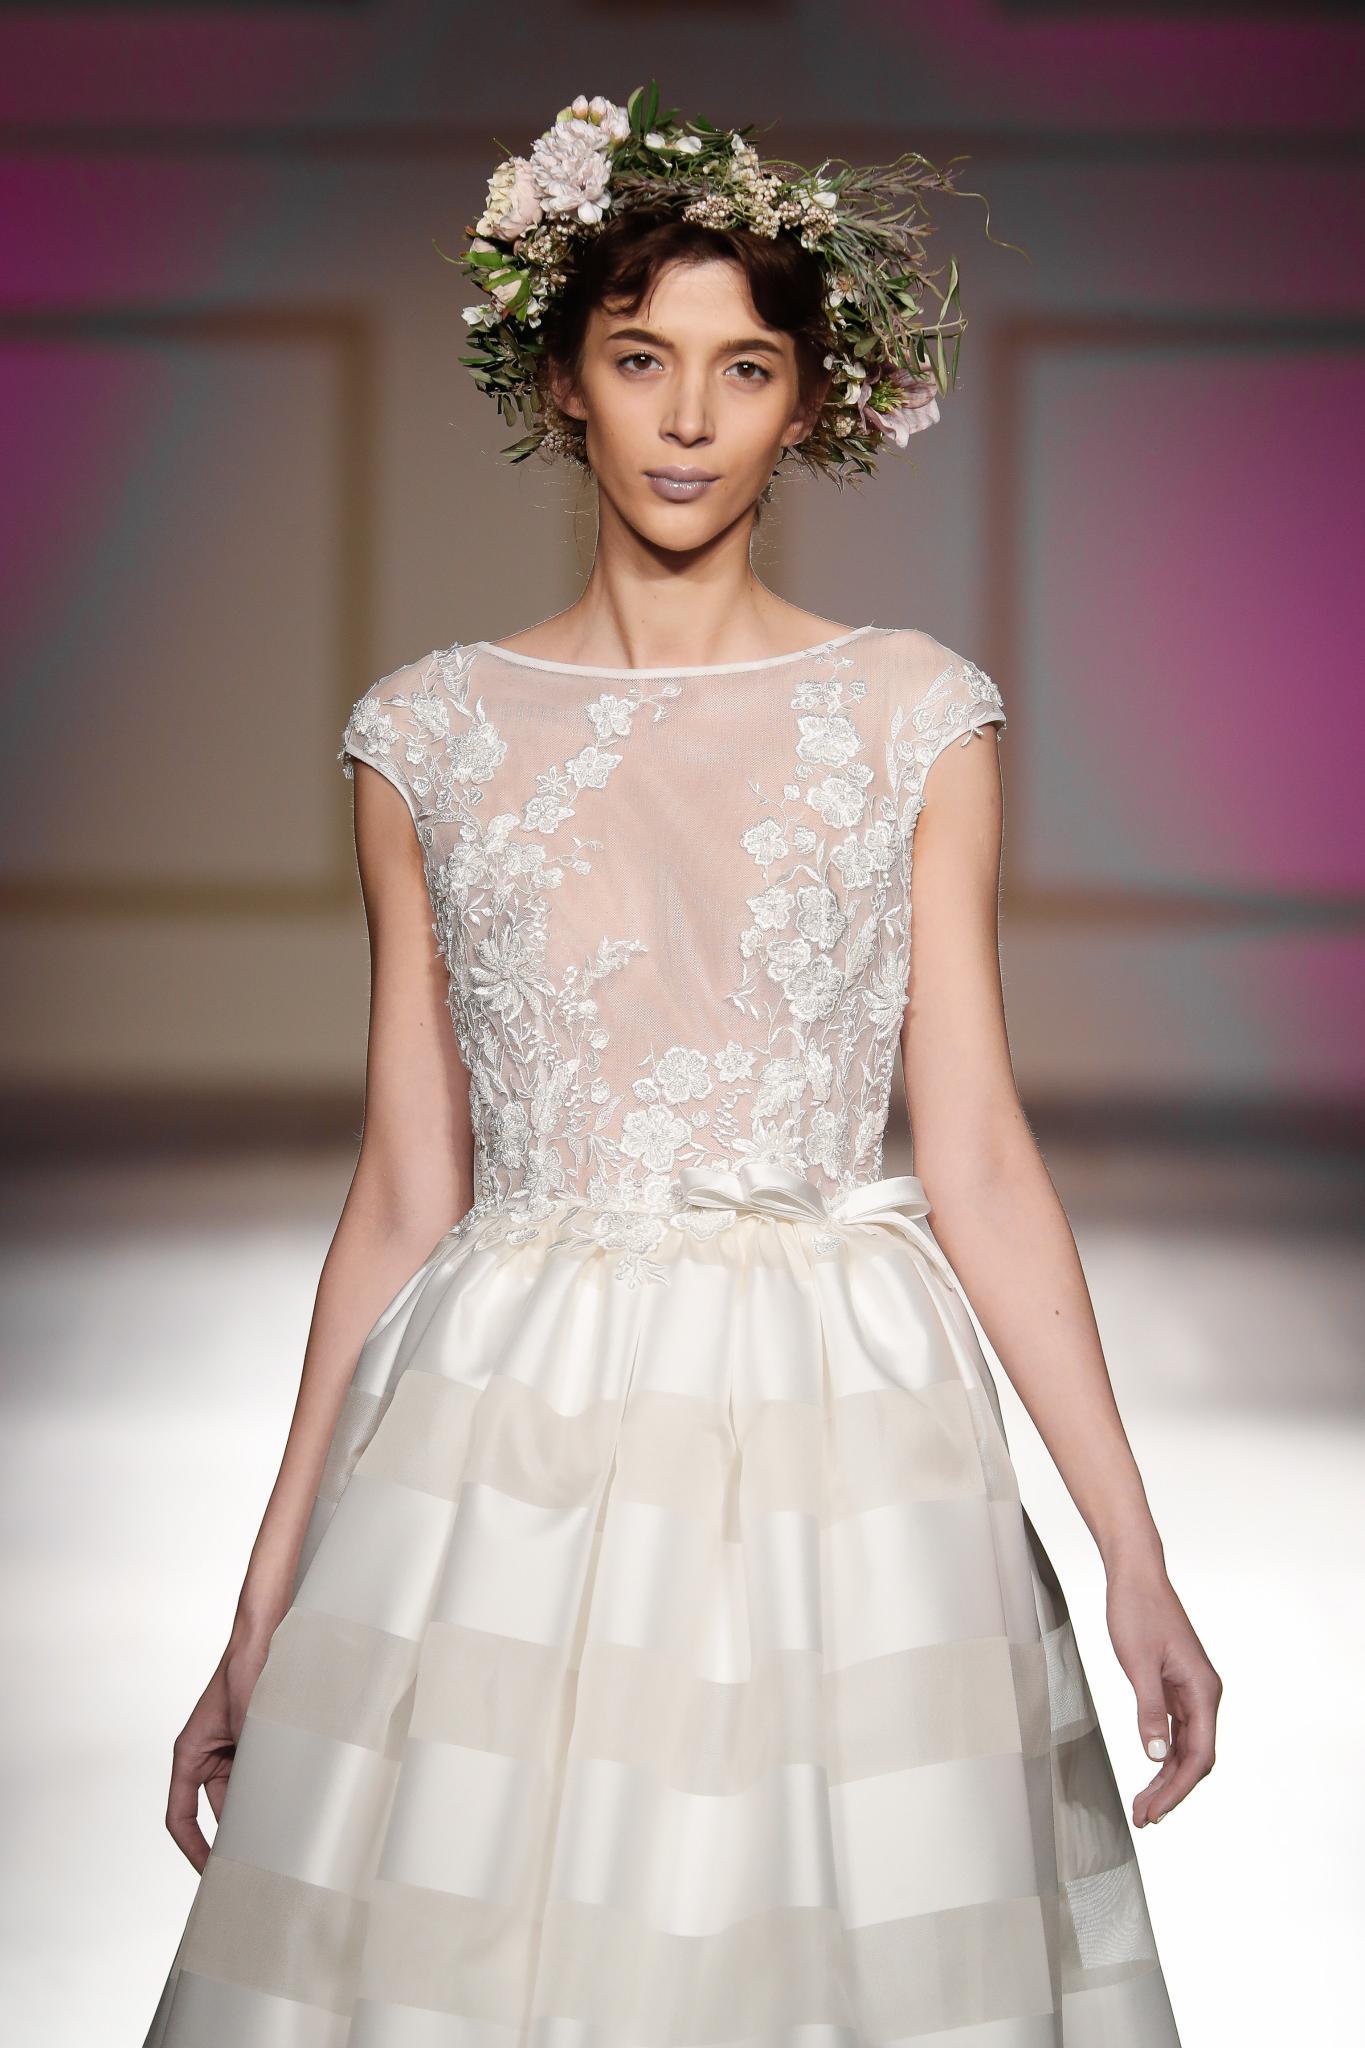 peinado para boda recogido flequillo abierto corona de flores accesorio bellantuono